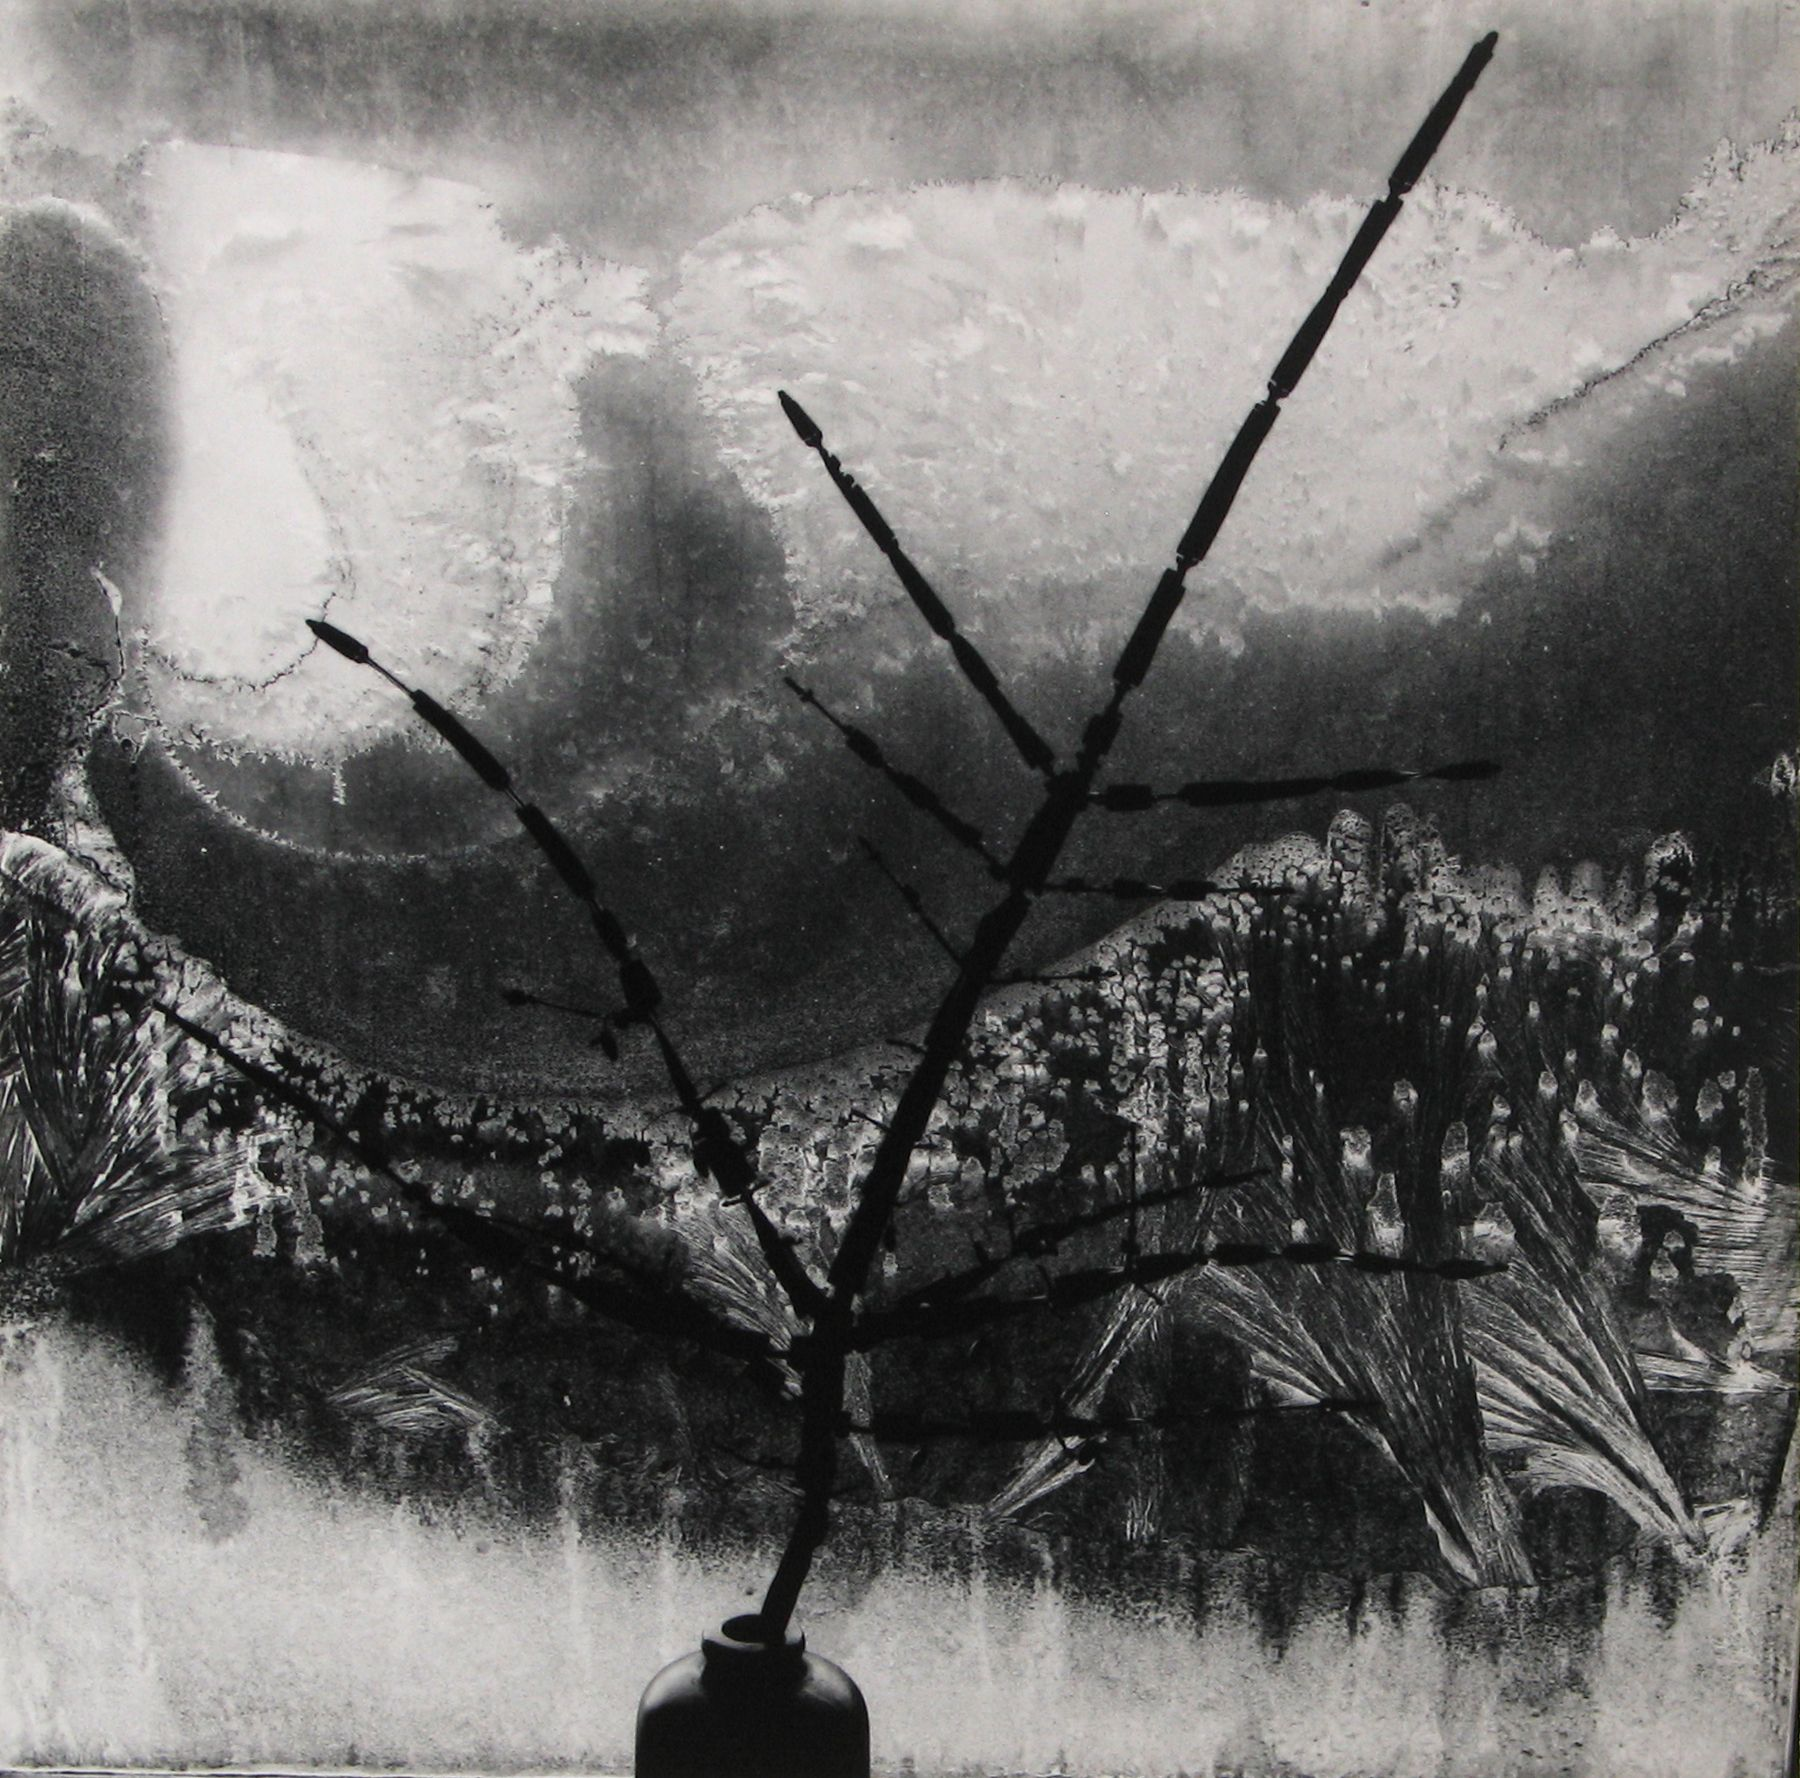 Minor White - Ritual Brach, 1958 - Howard Greenberg Gallery